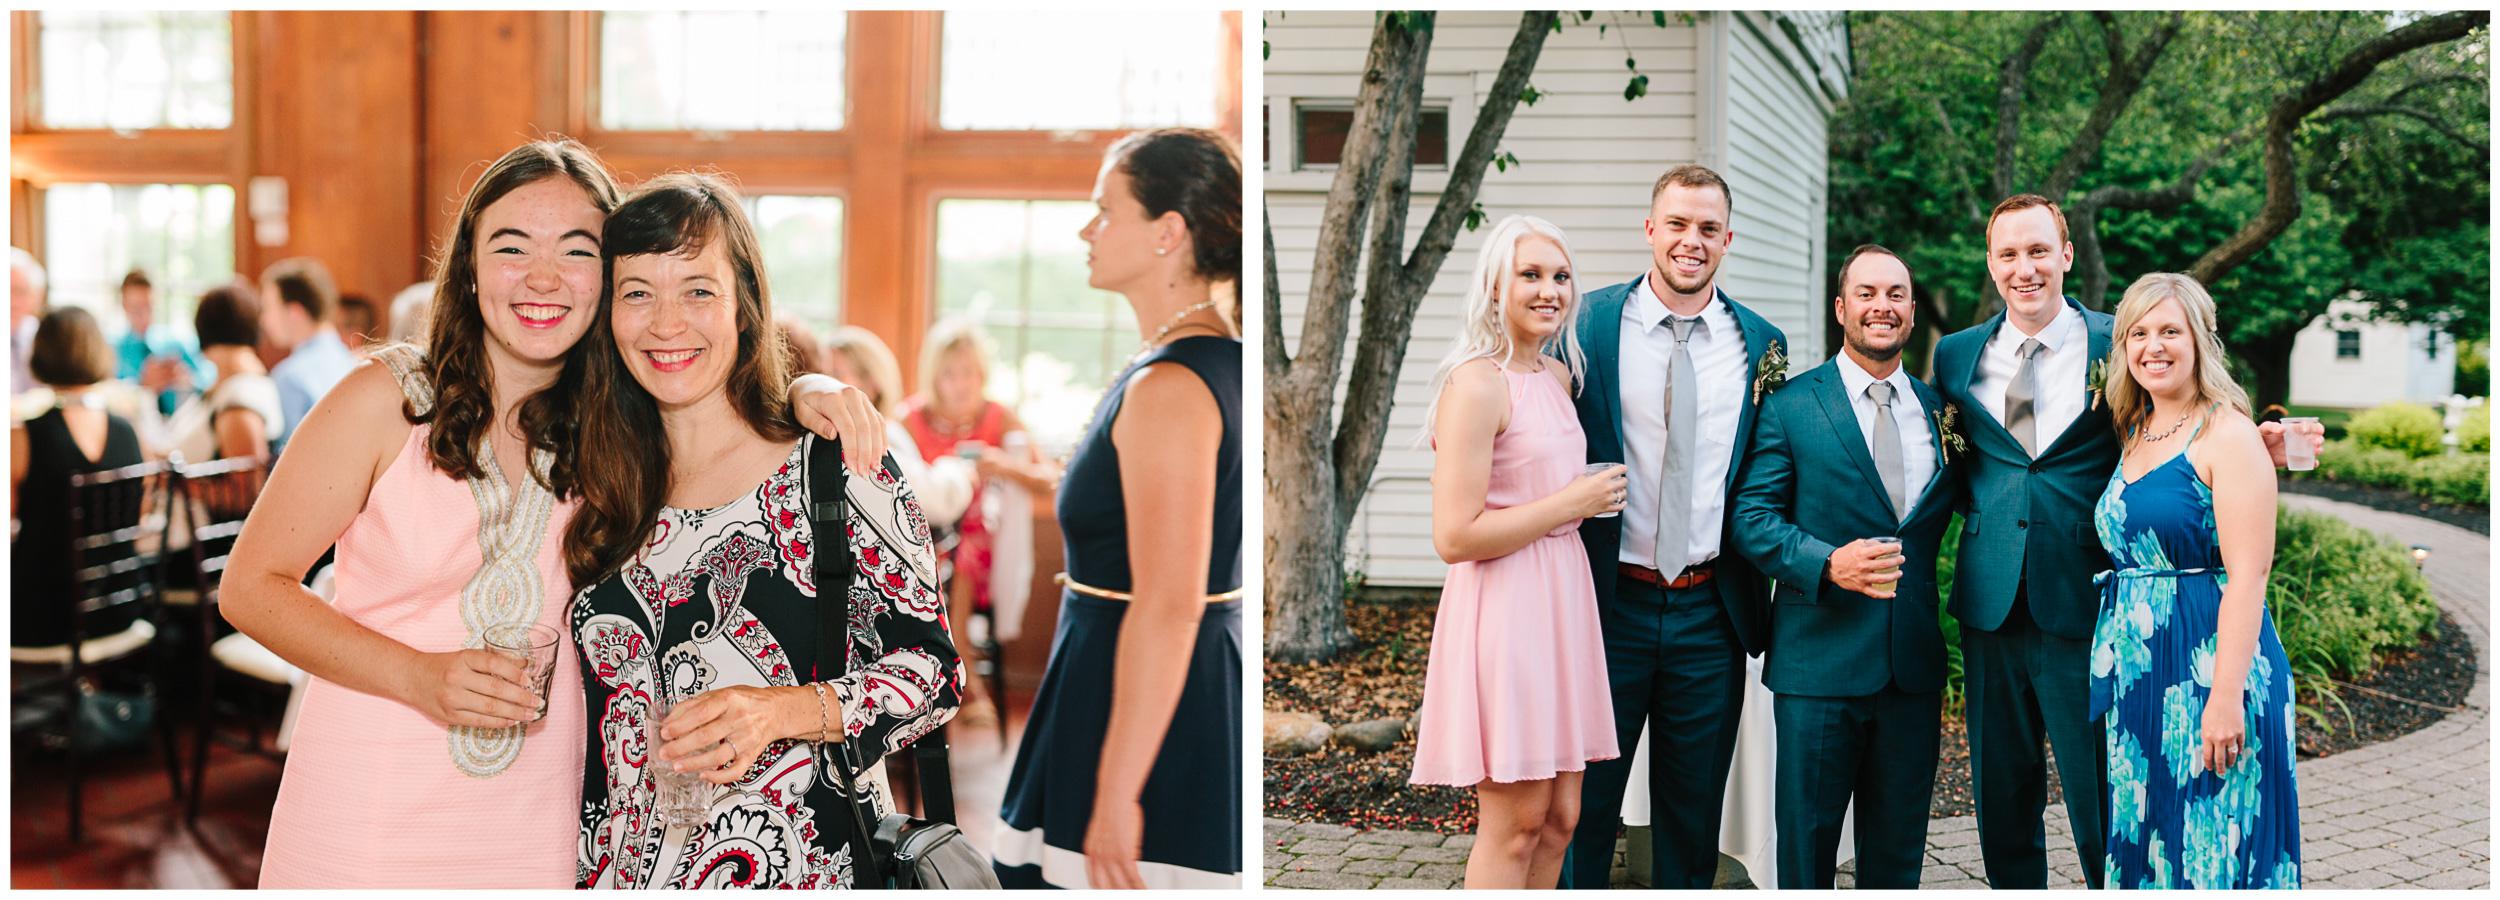 ann_arbor_michigan_wedding_76.jpg